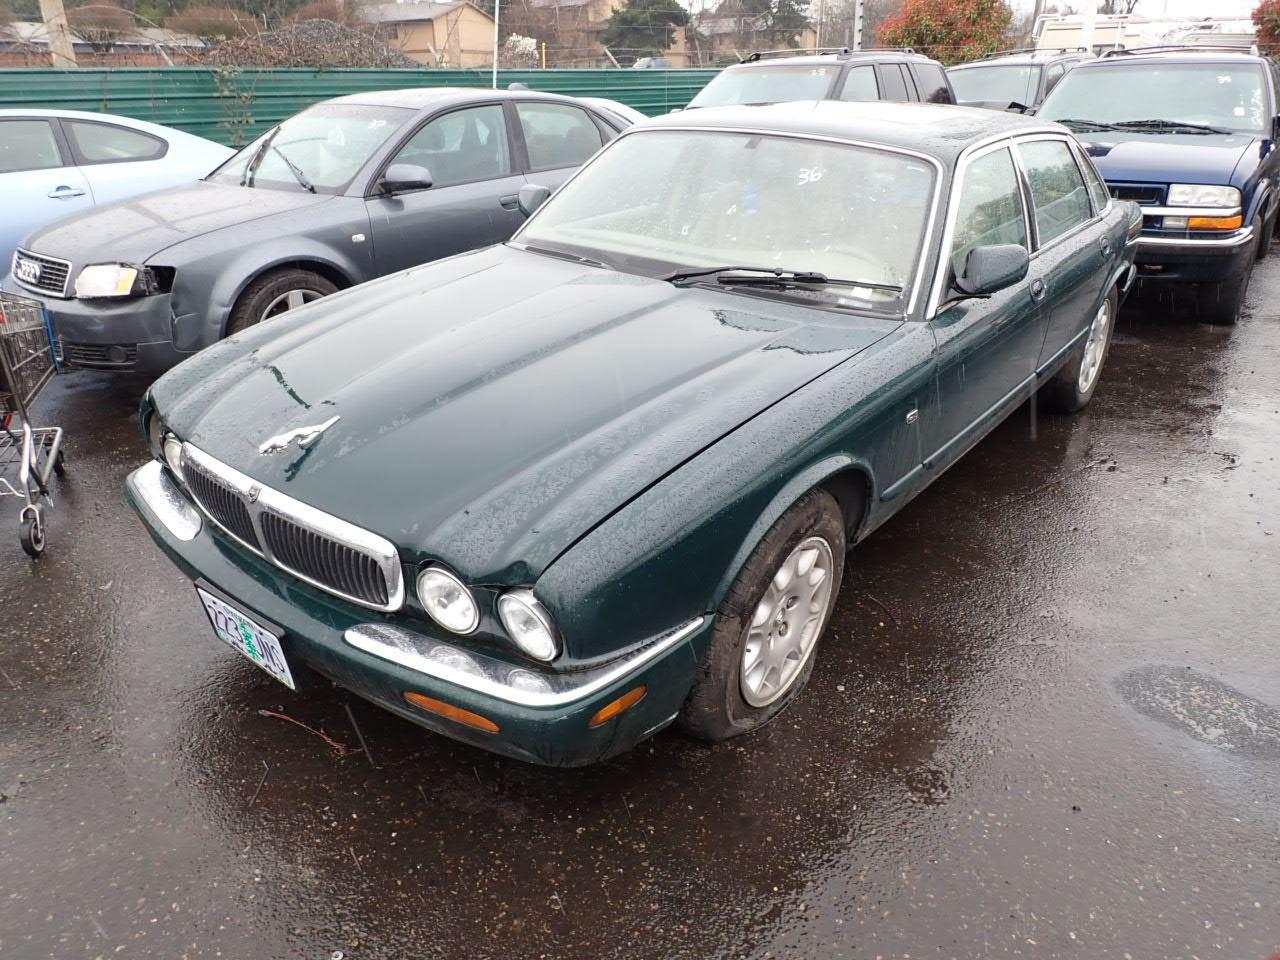 1999 Jaguar XJ8 - Speeds Auto Auctions